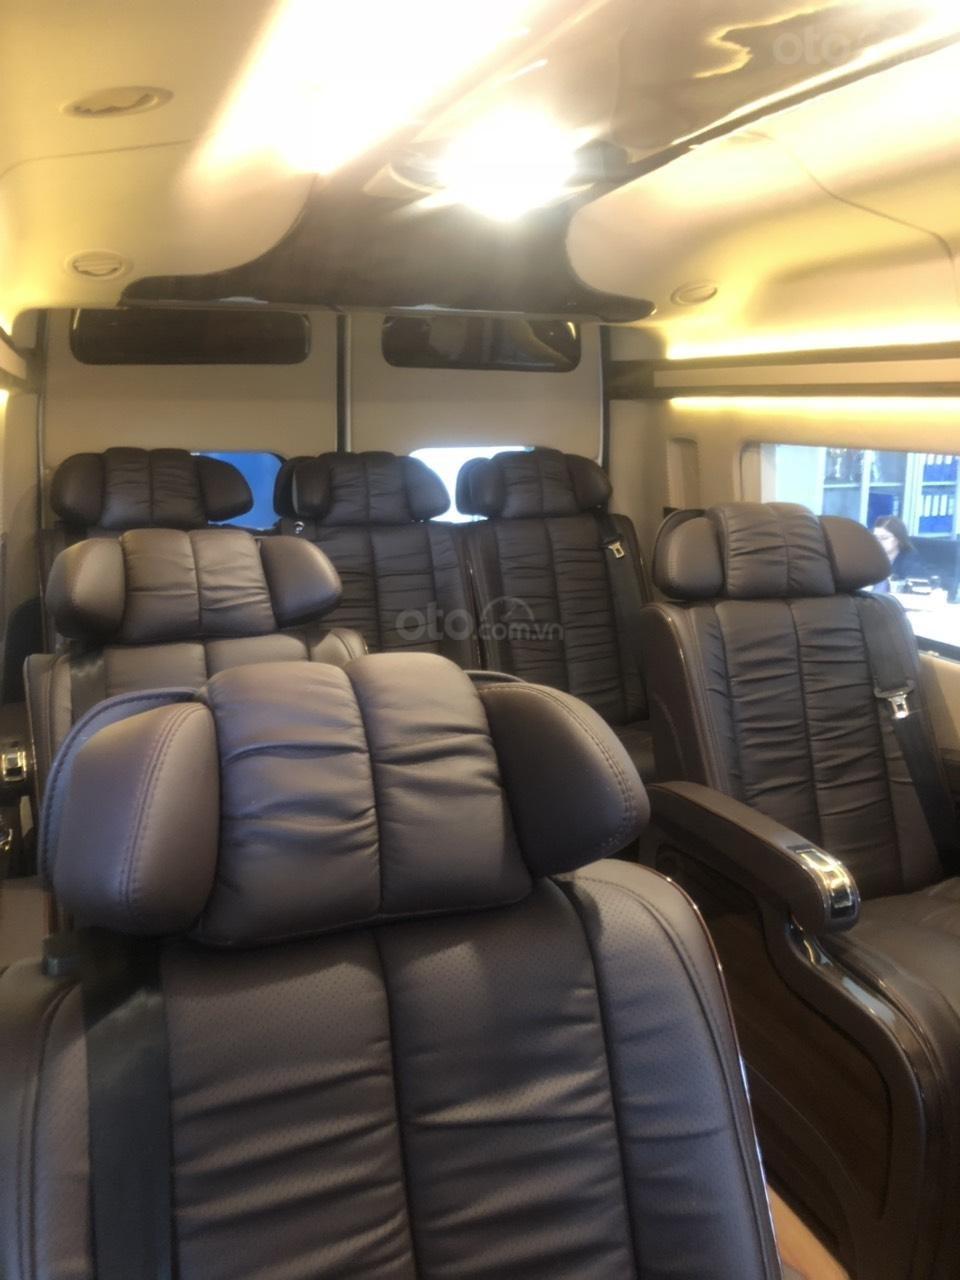 Transit Limousine 10 chỗ 2019 (2)